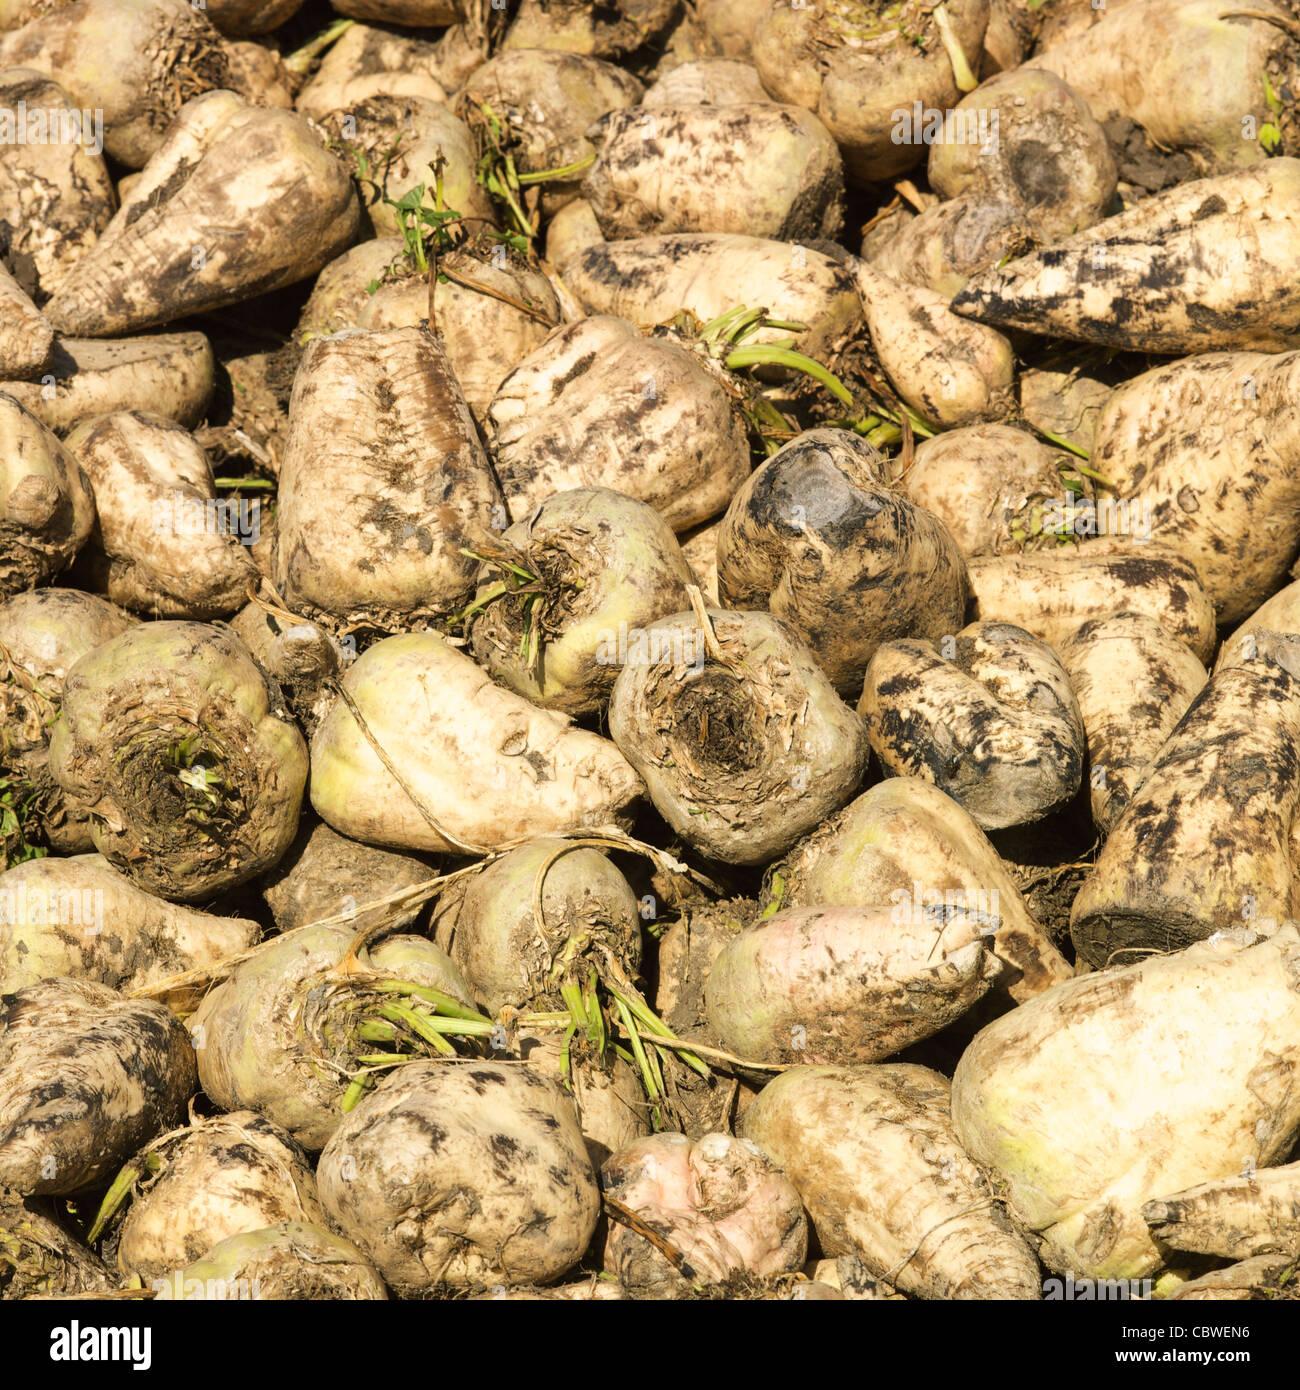 Sugar Beet (Beta vulgaris) Stock Photo